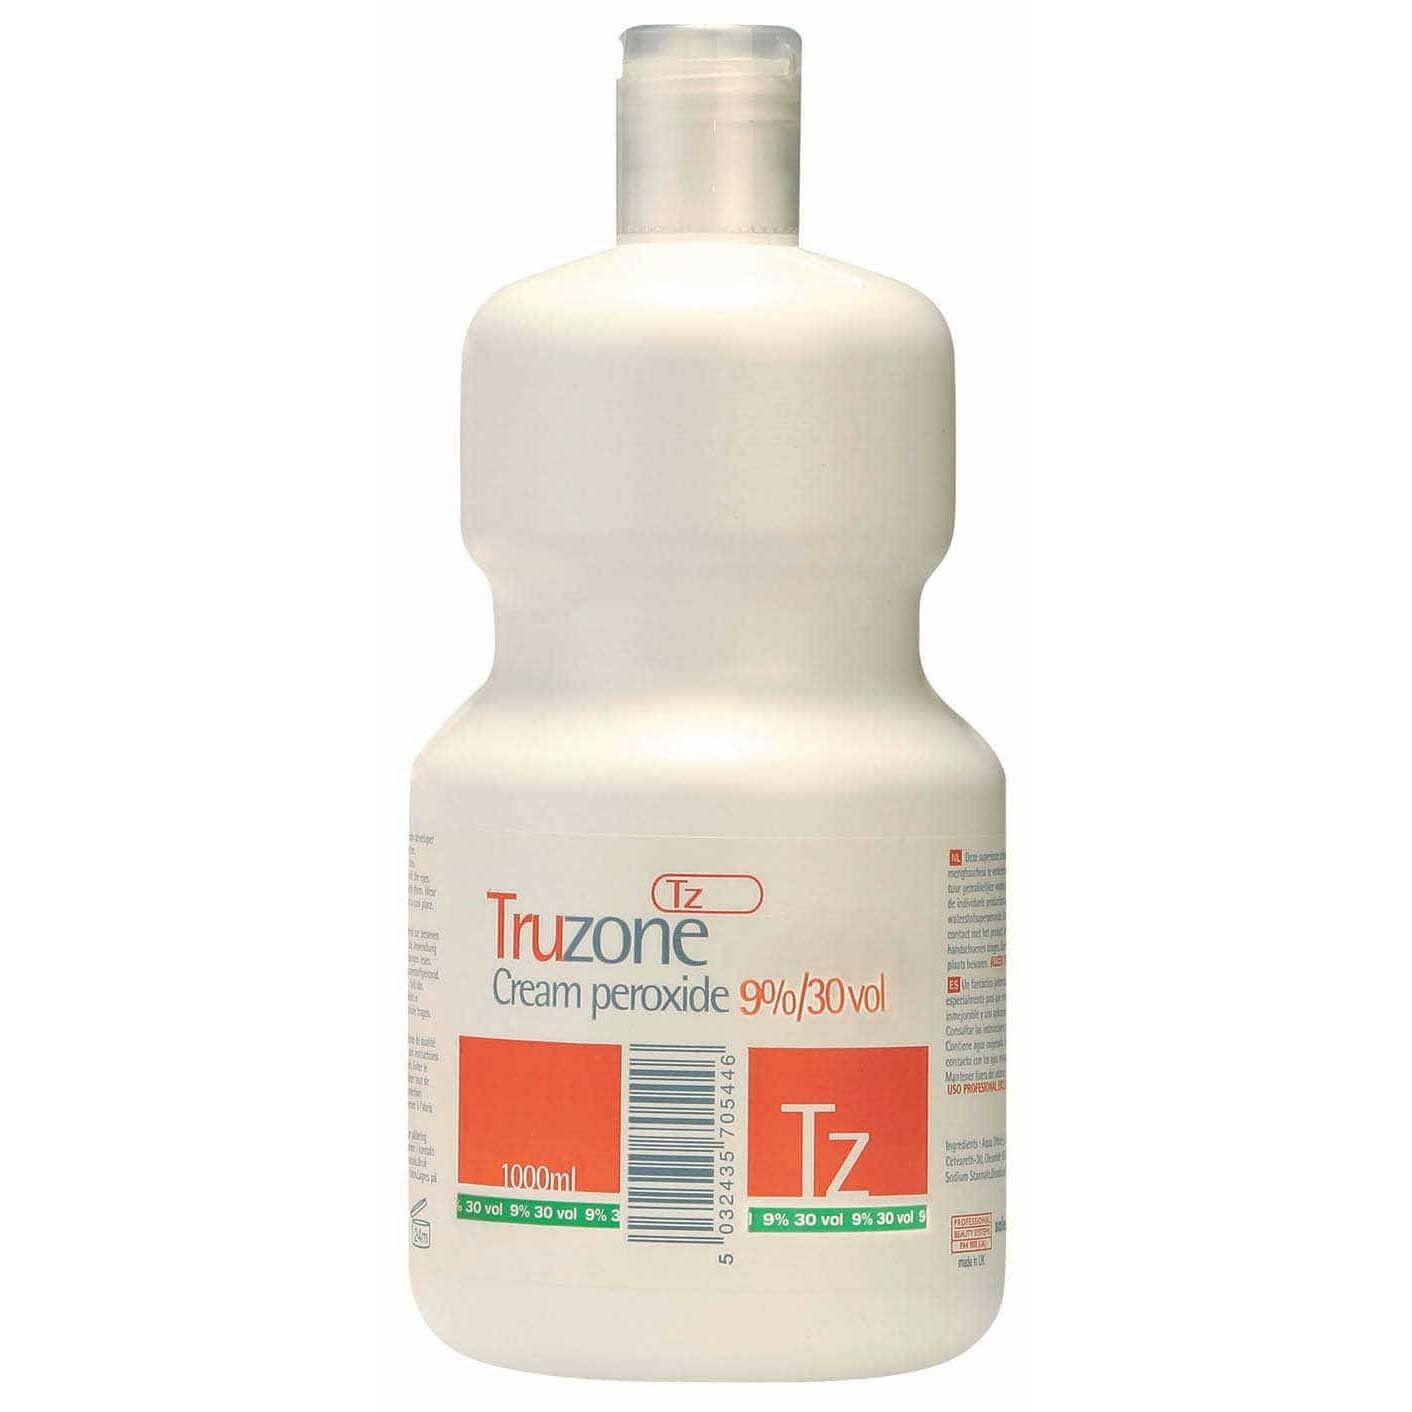 Truzone Cream Peroxide 9% 30 Vol - 1000ml